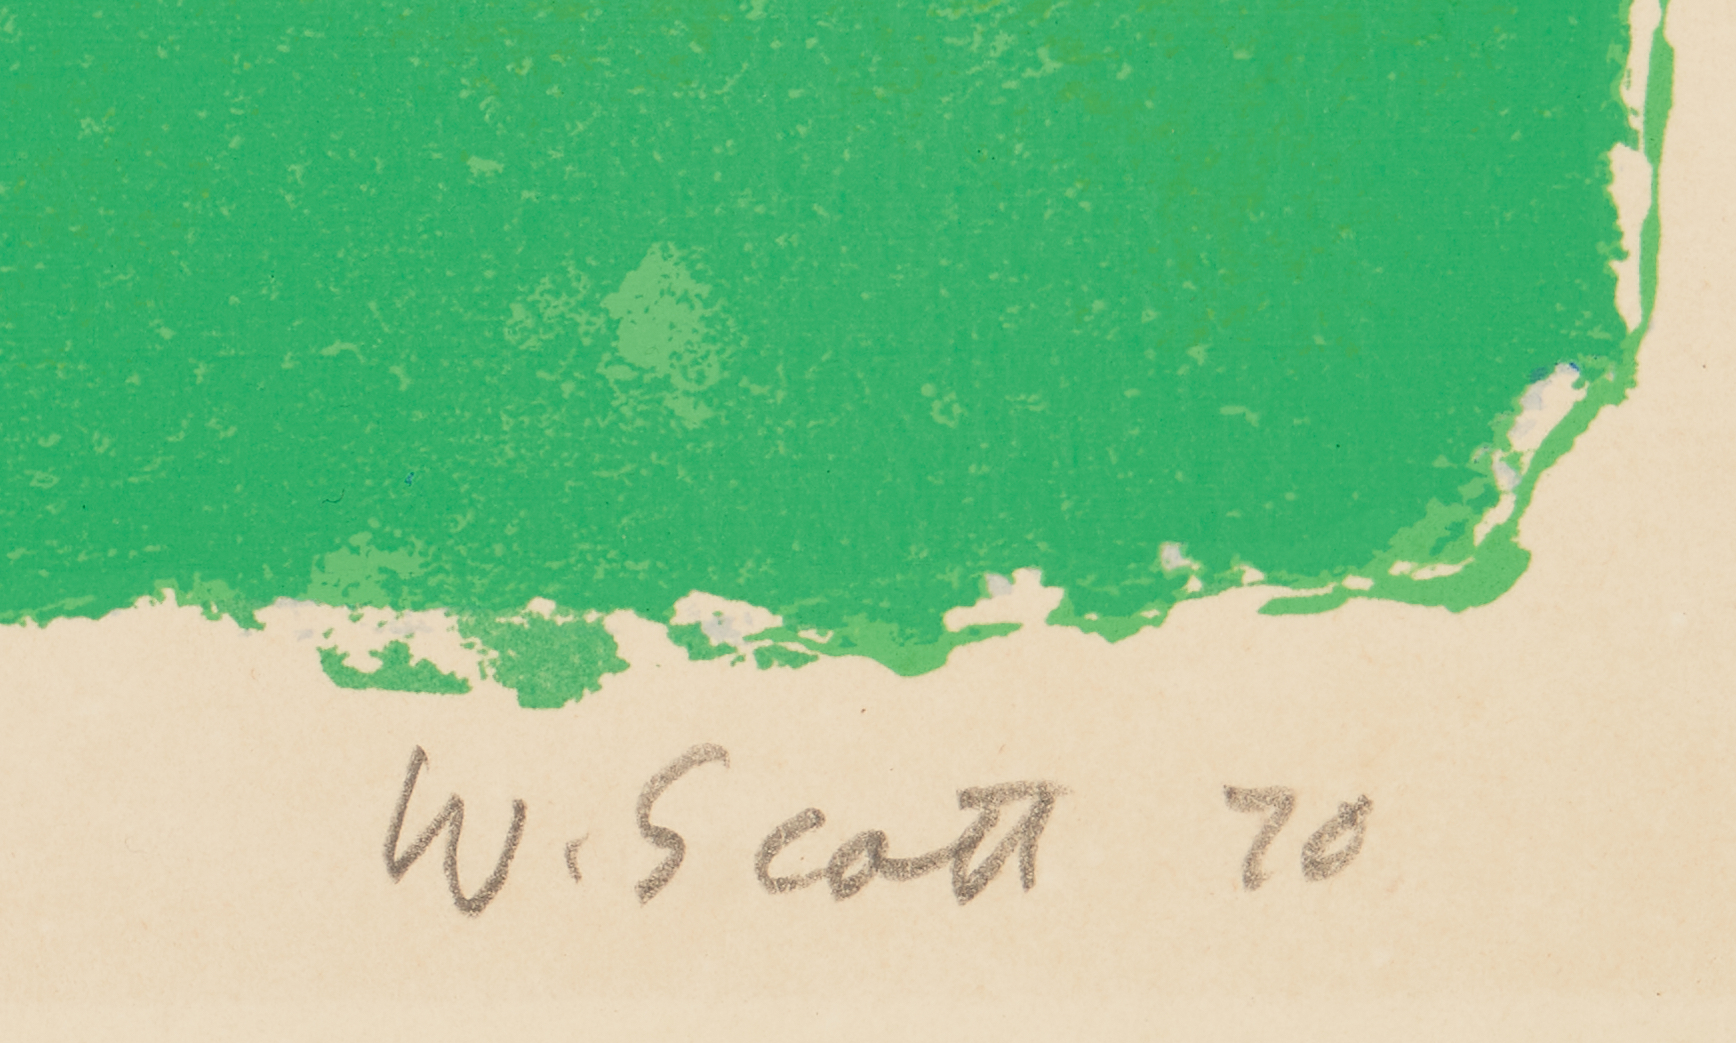 Lot 571: William Scott Screenprint, Bottle and Bowl, Blues on Green